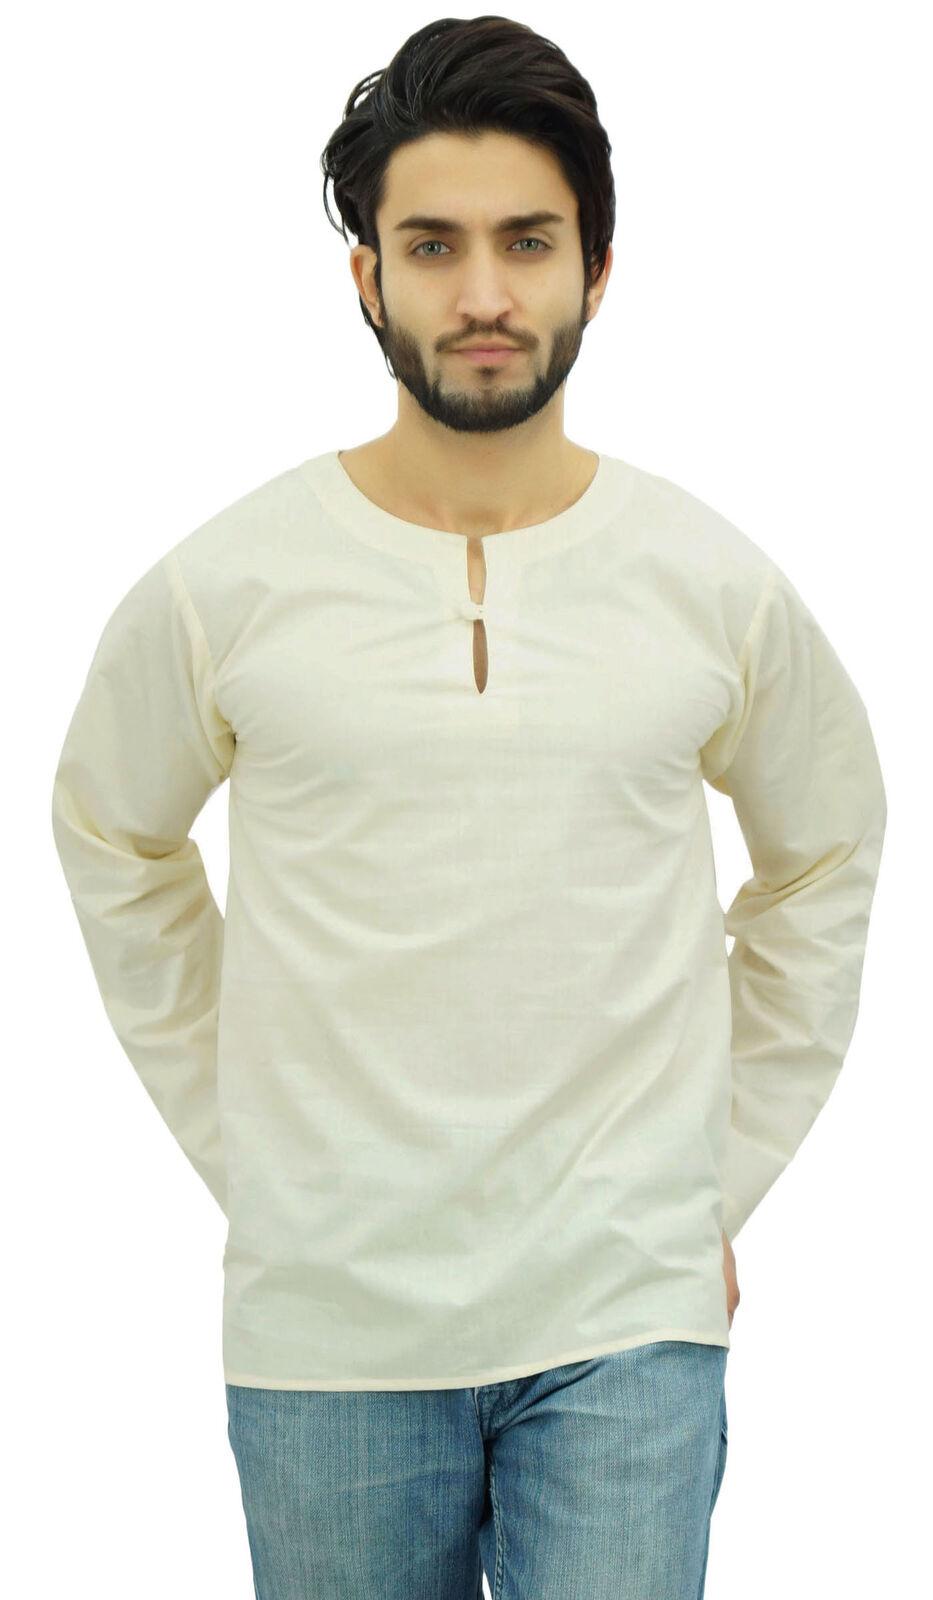 Atasi Men's Off White Short Kurta Round Keyhole Neck Cotton Shirt-Small-G7A